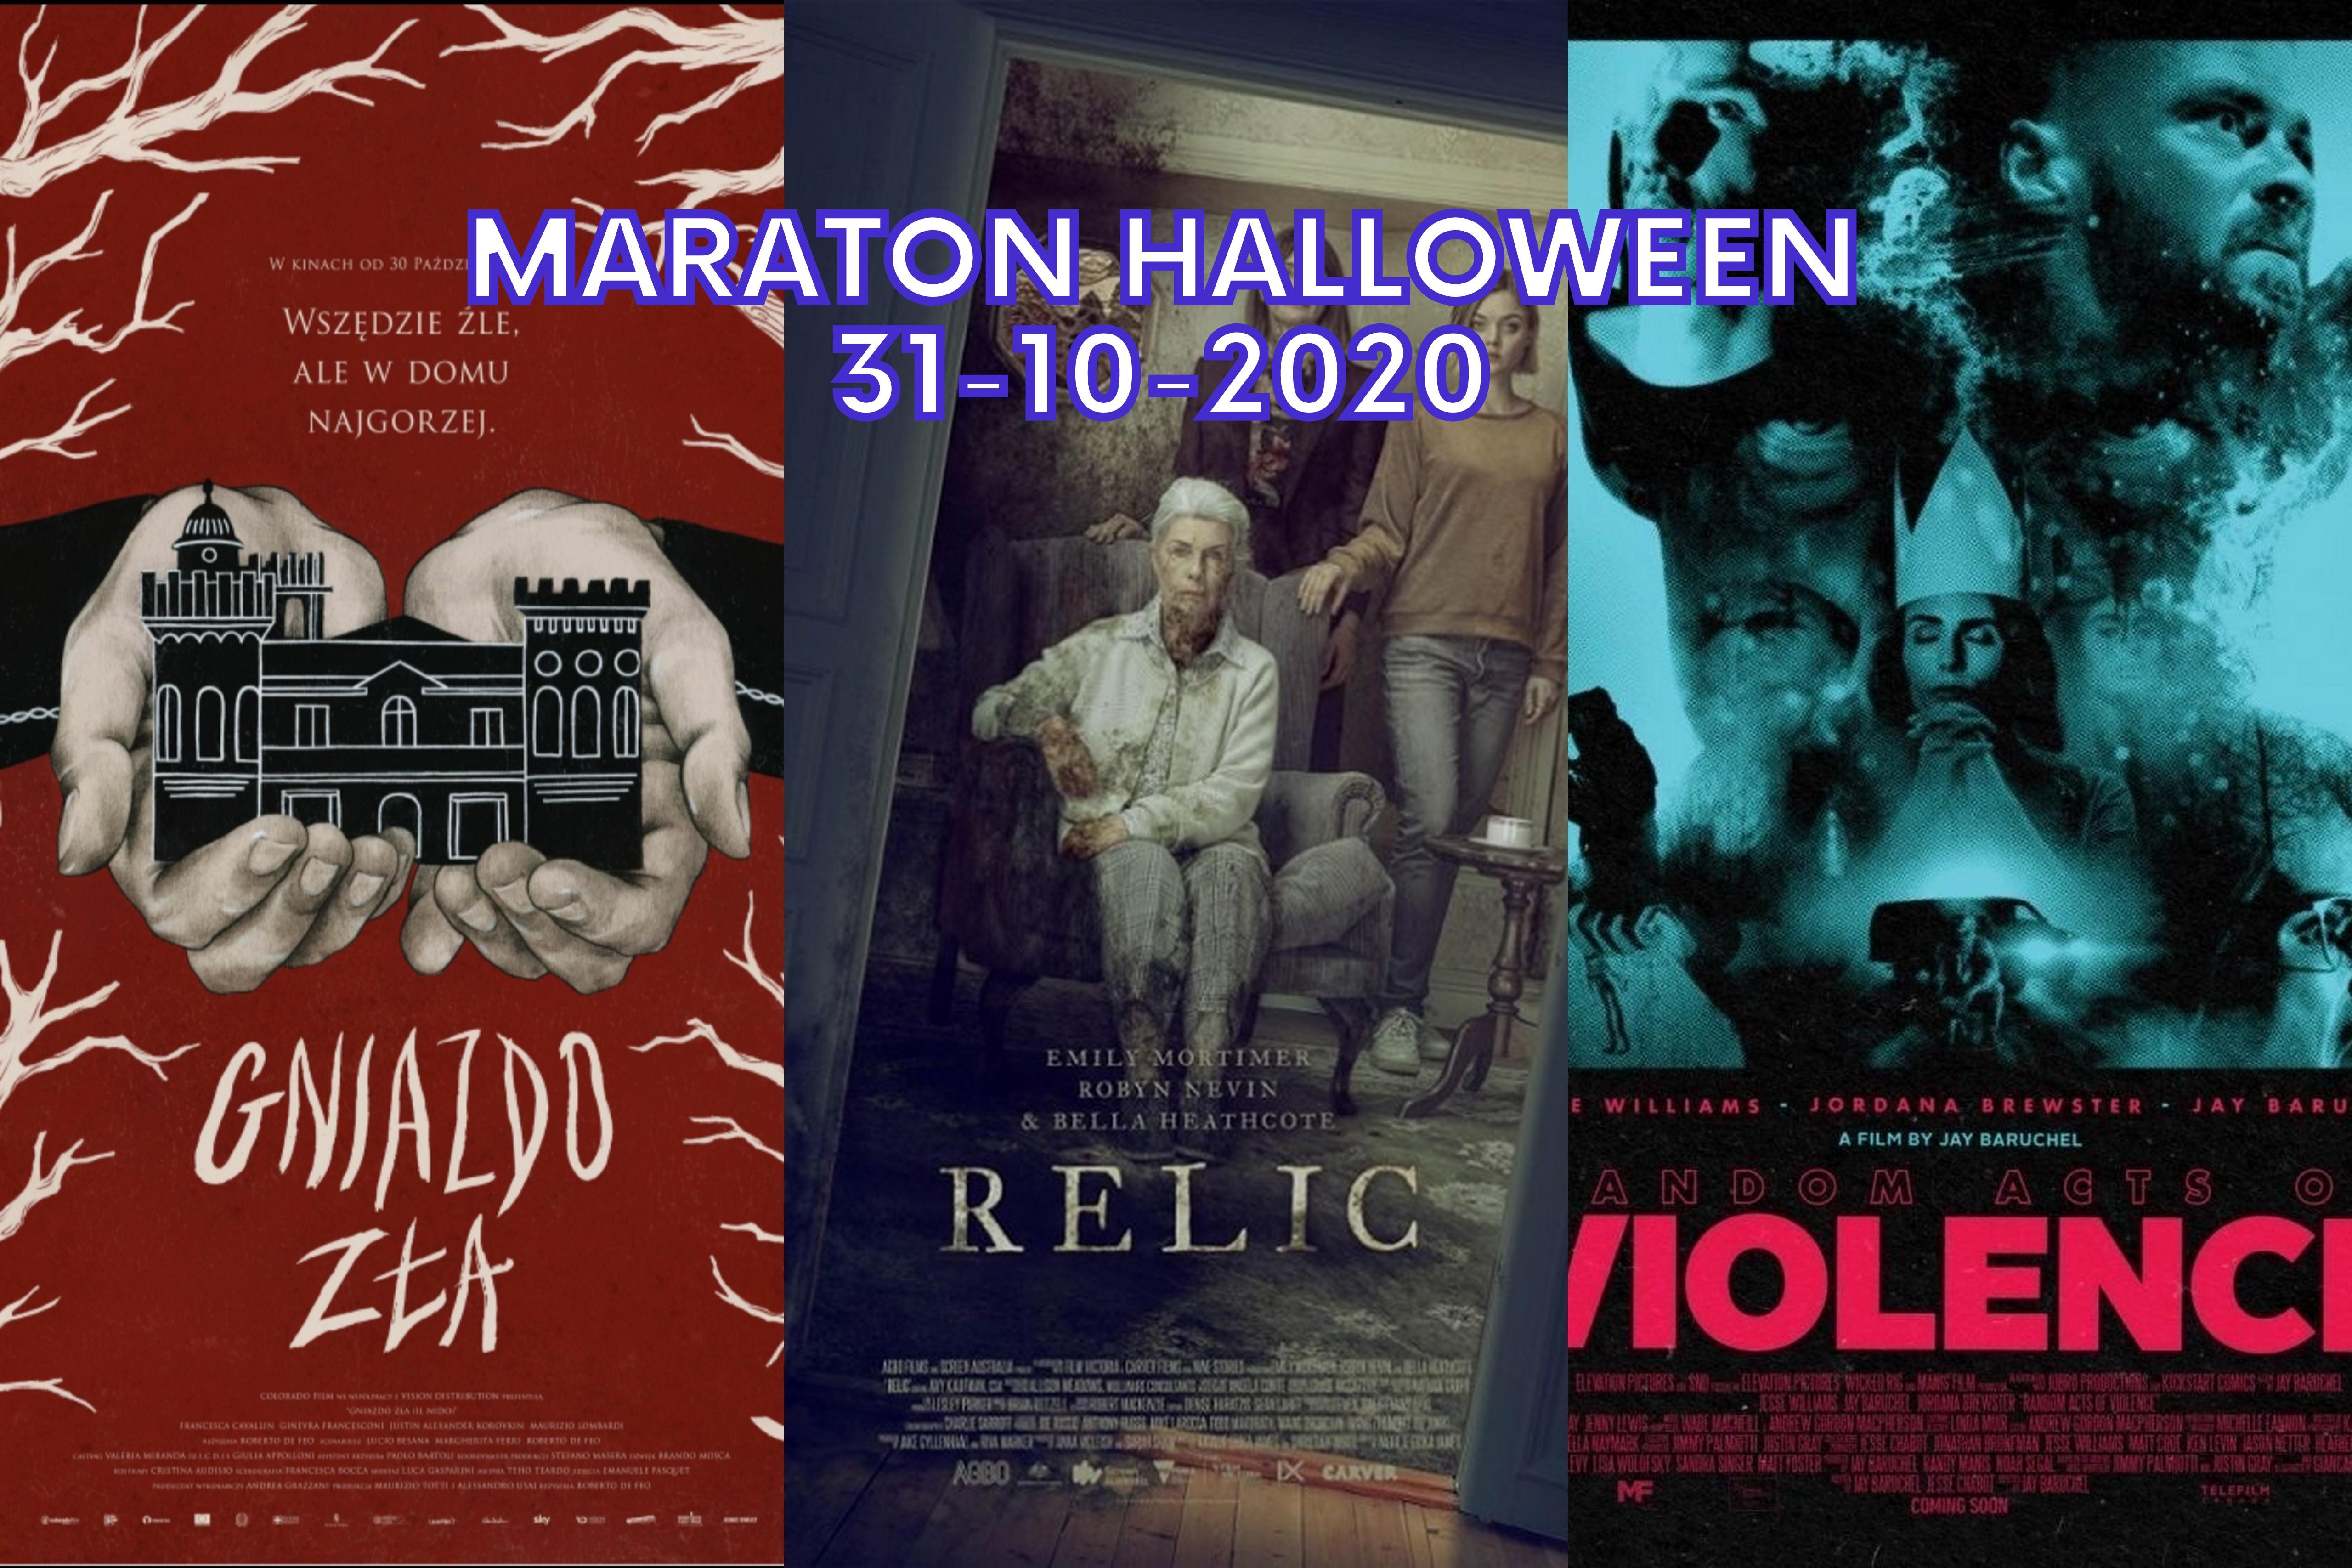 Maraton Halloween 2020: Gniazdo zła / Relic / Slasherman (Random Acts Of Violence)